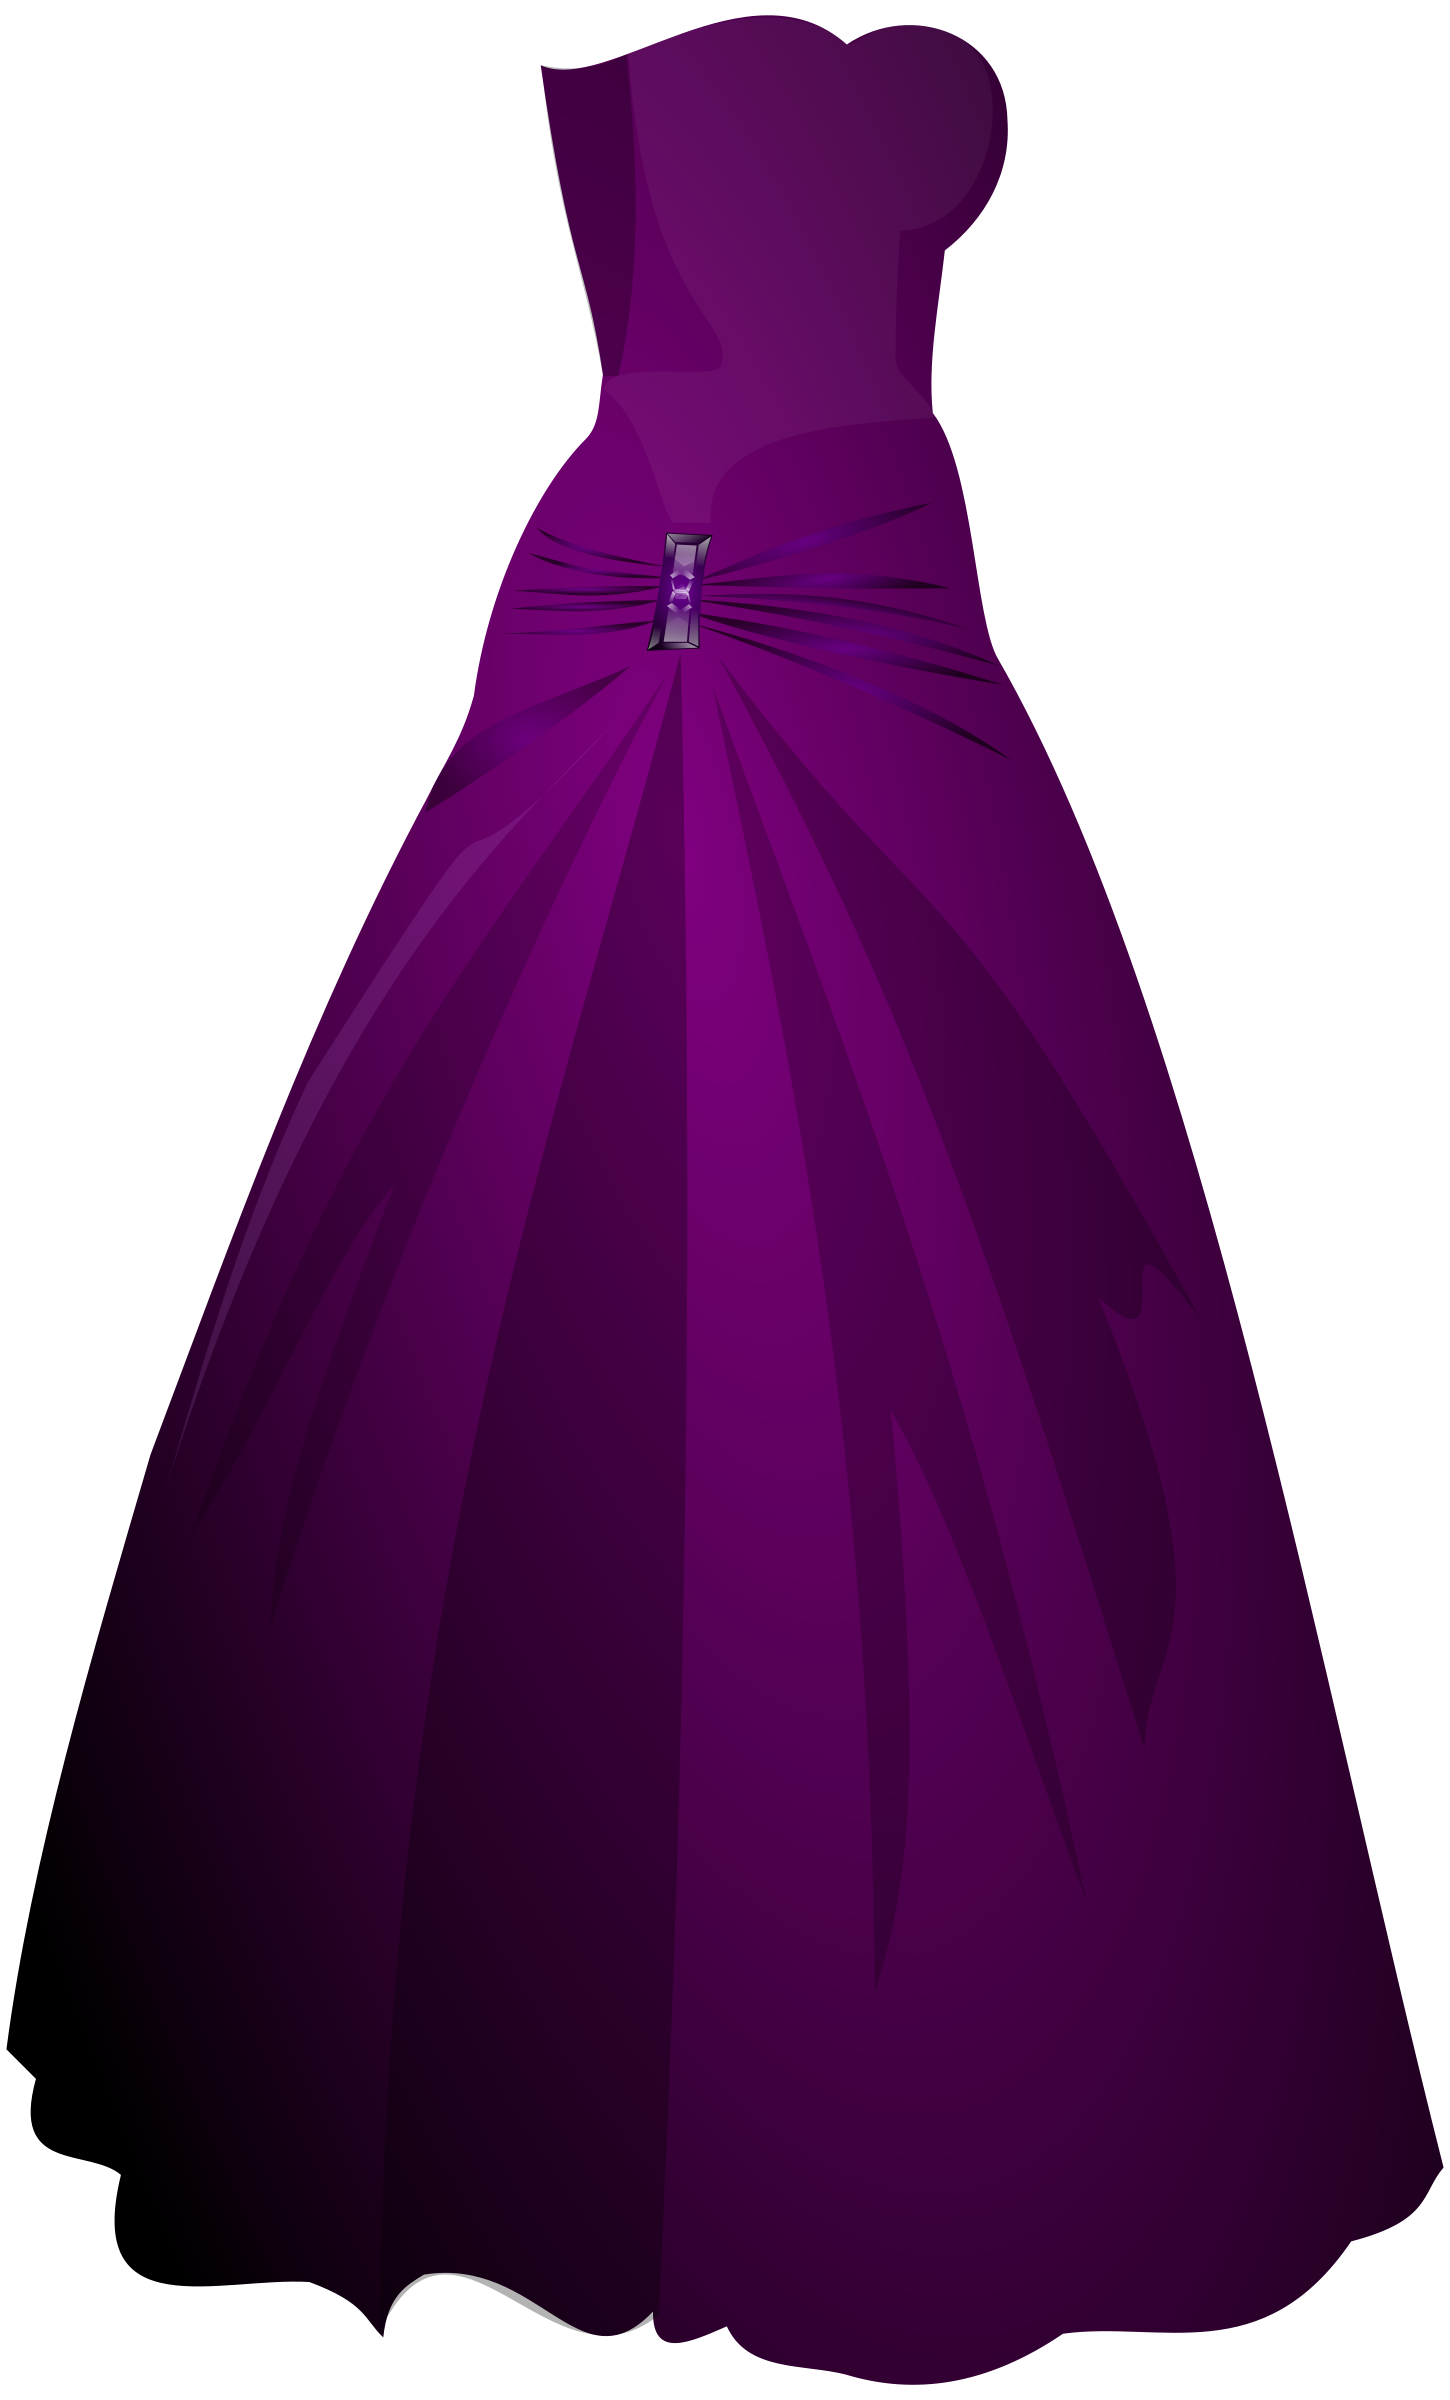 Dress Clip Art Free Clipart .-Dress Clip Art Free Clipart .-1